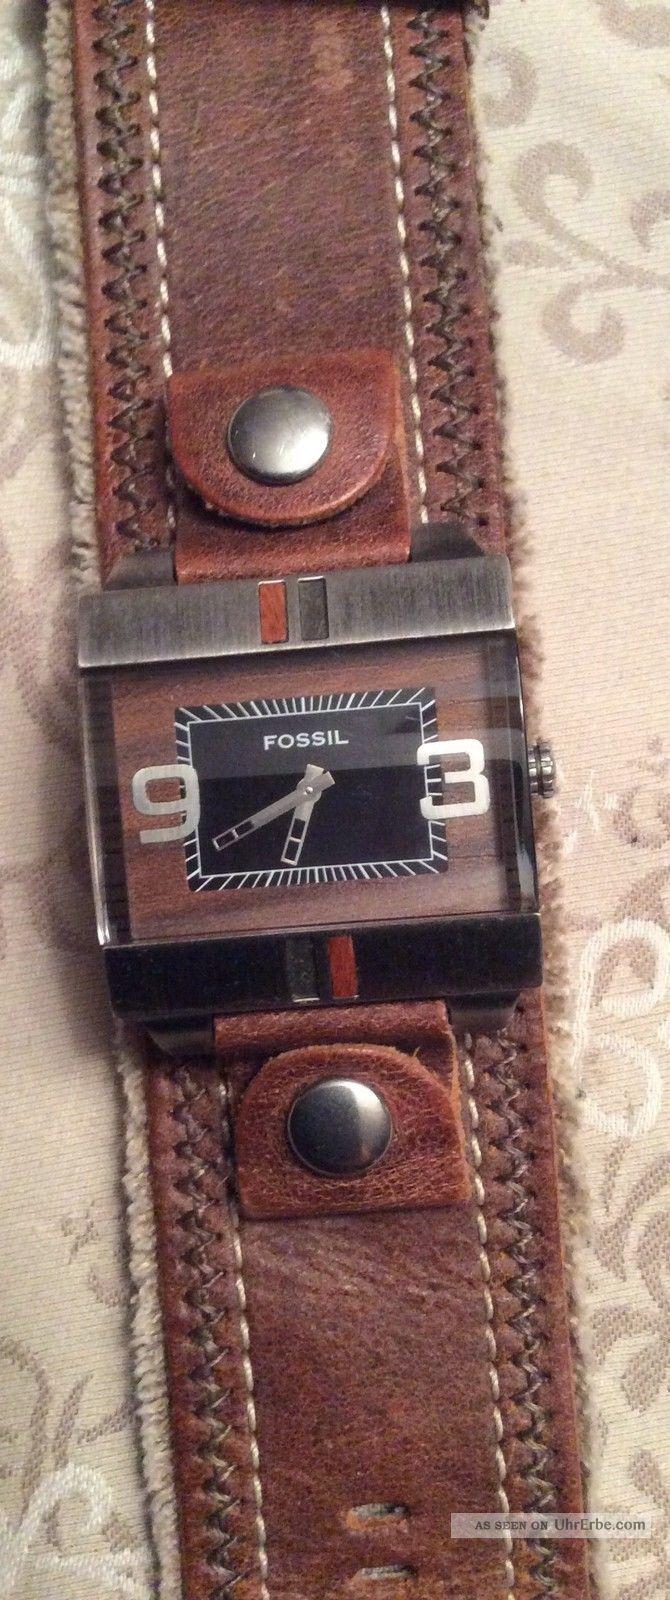 Fossil - Herren - Uhr - Wechselarmband Armbanduhren Bild